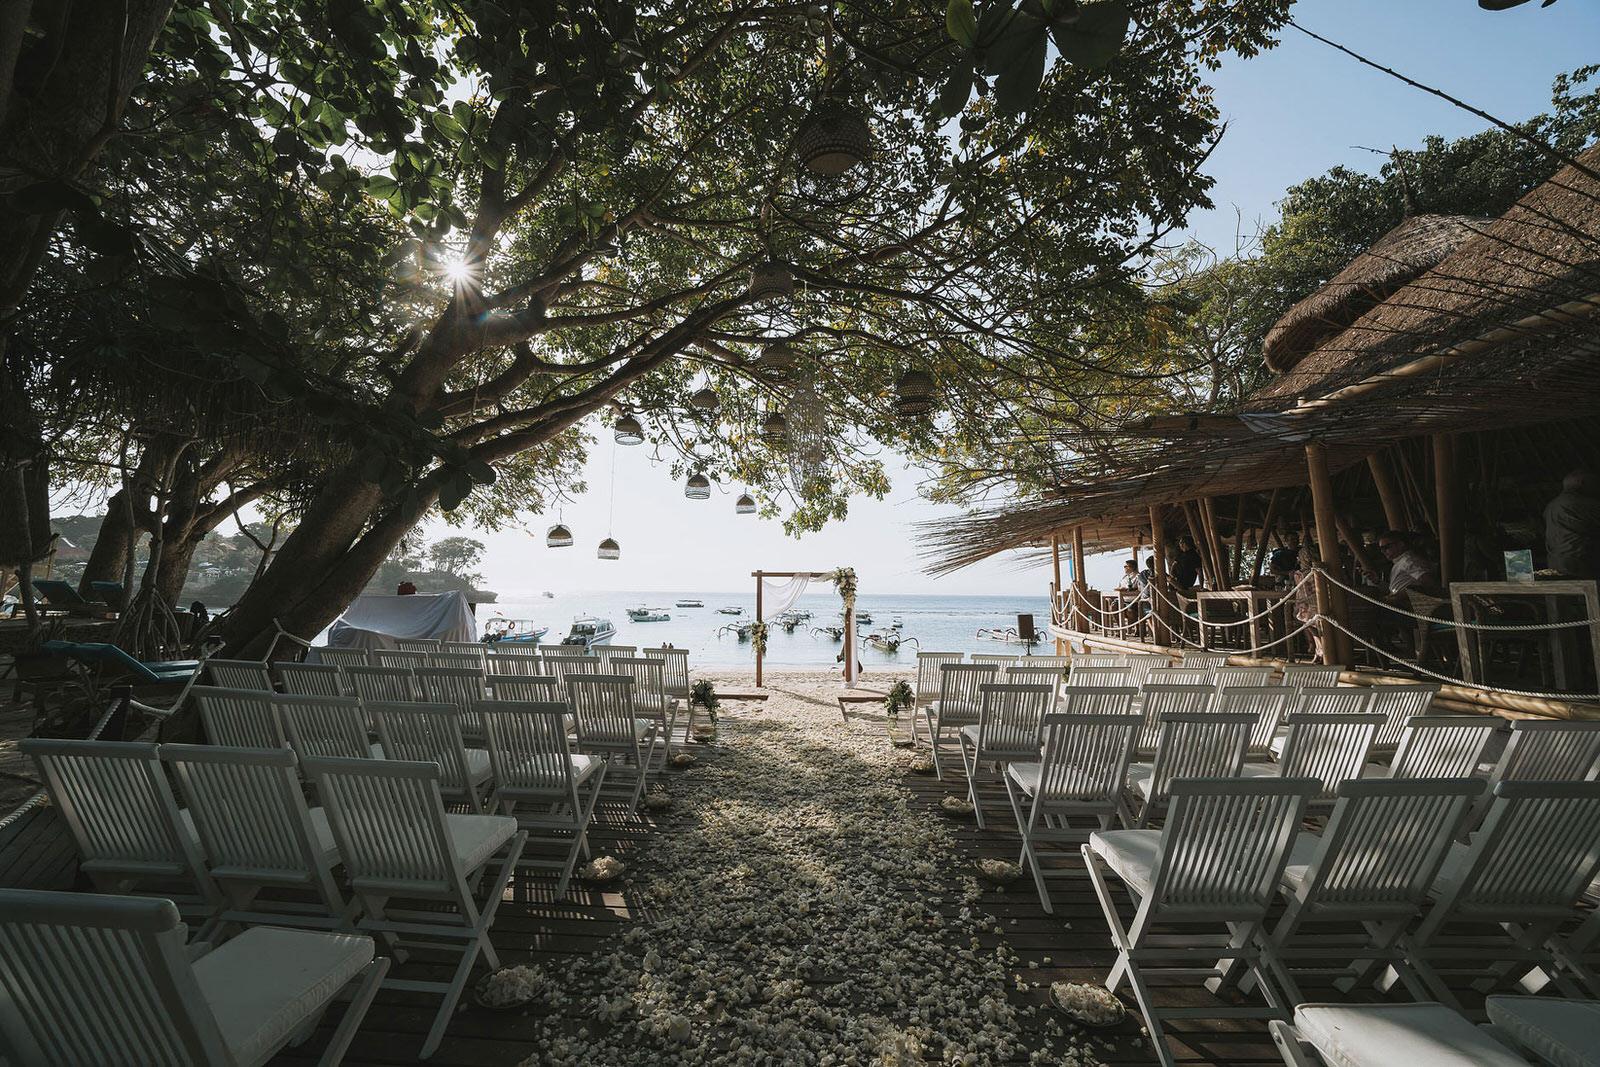 newfound-hai-tide-nusa-lembongan-bali-wedding-photographers-103